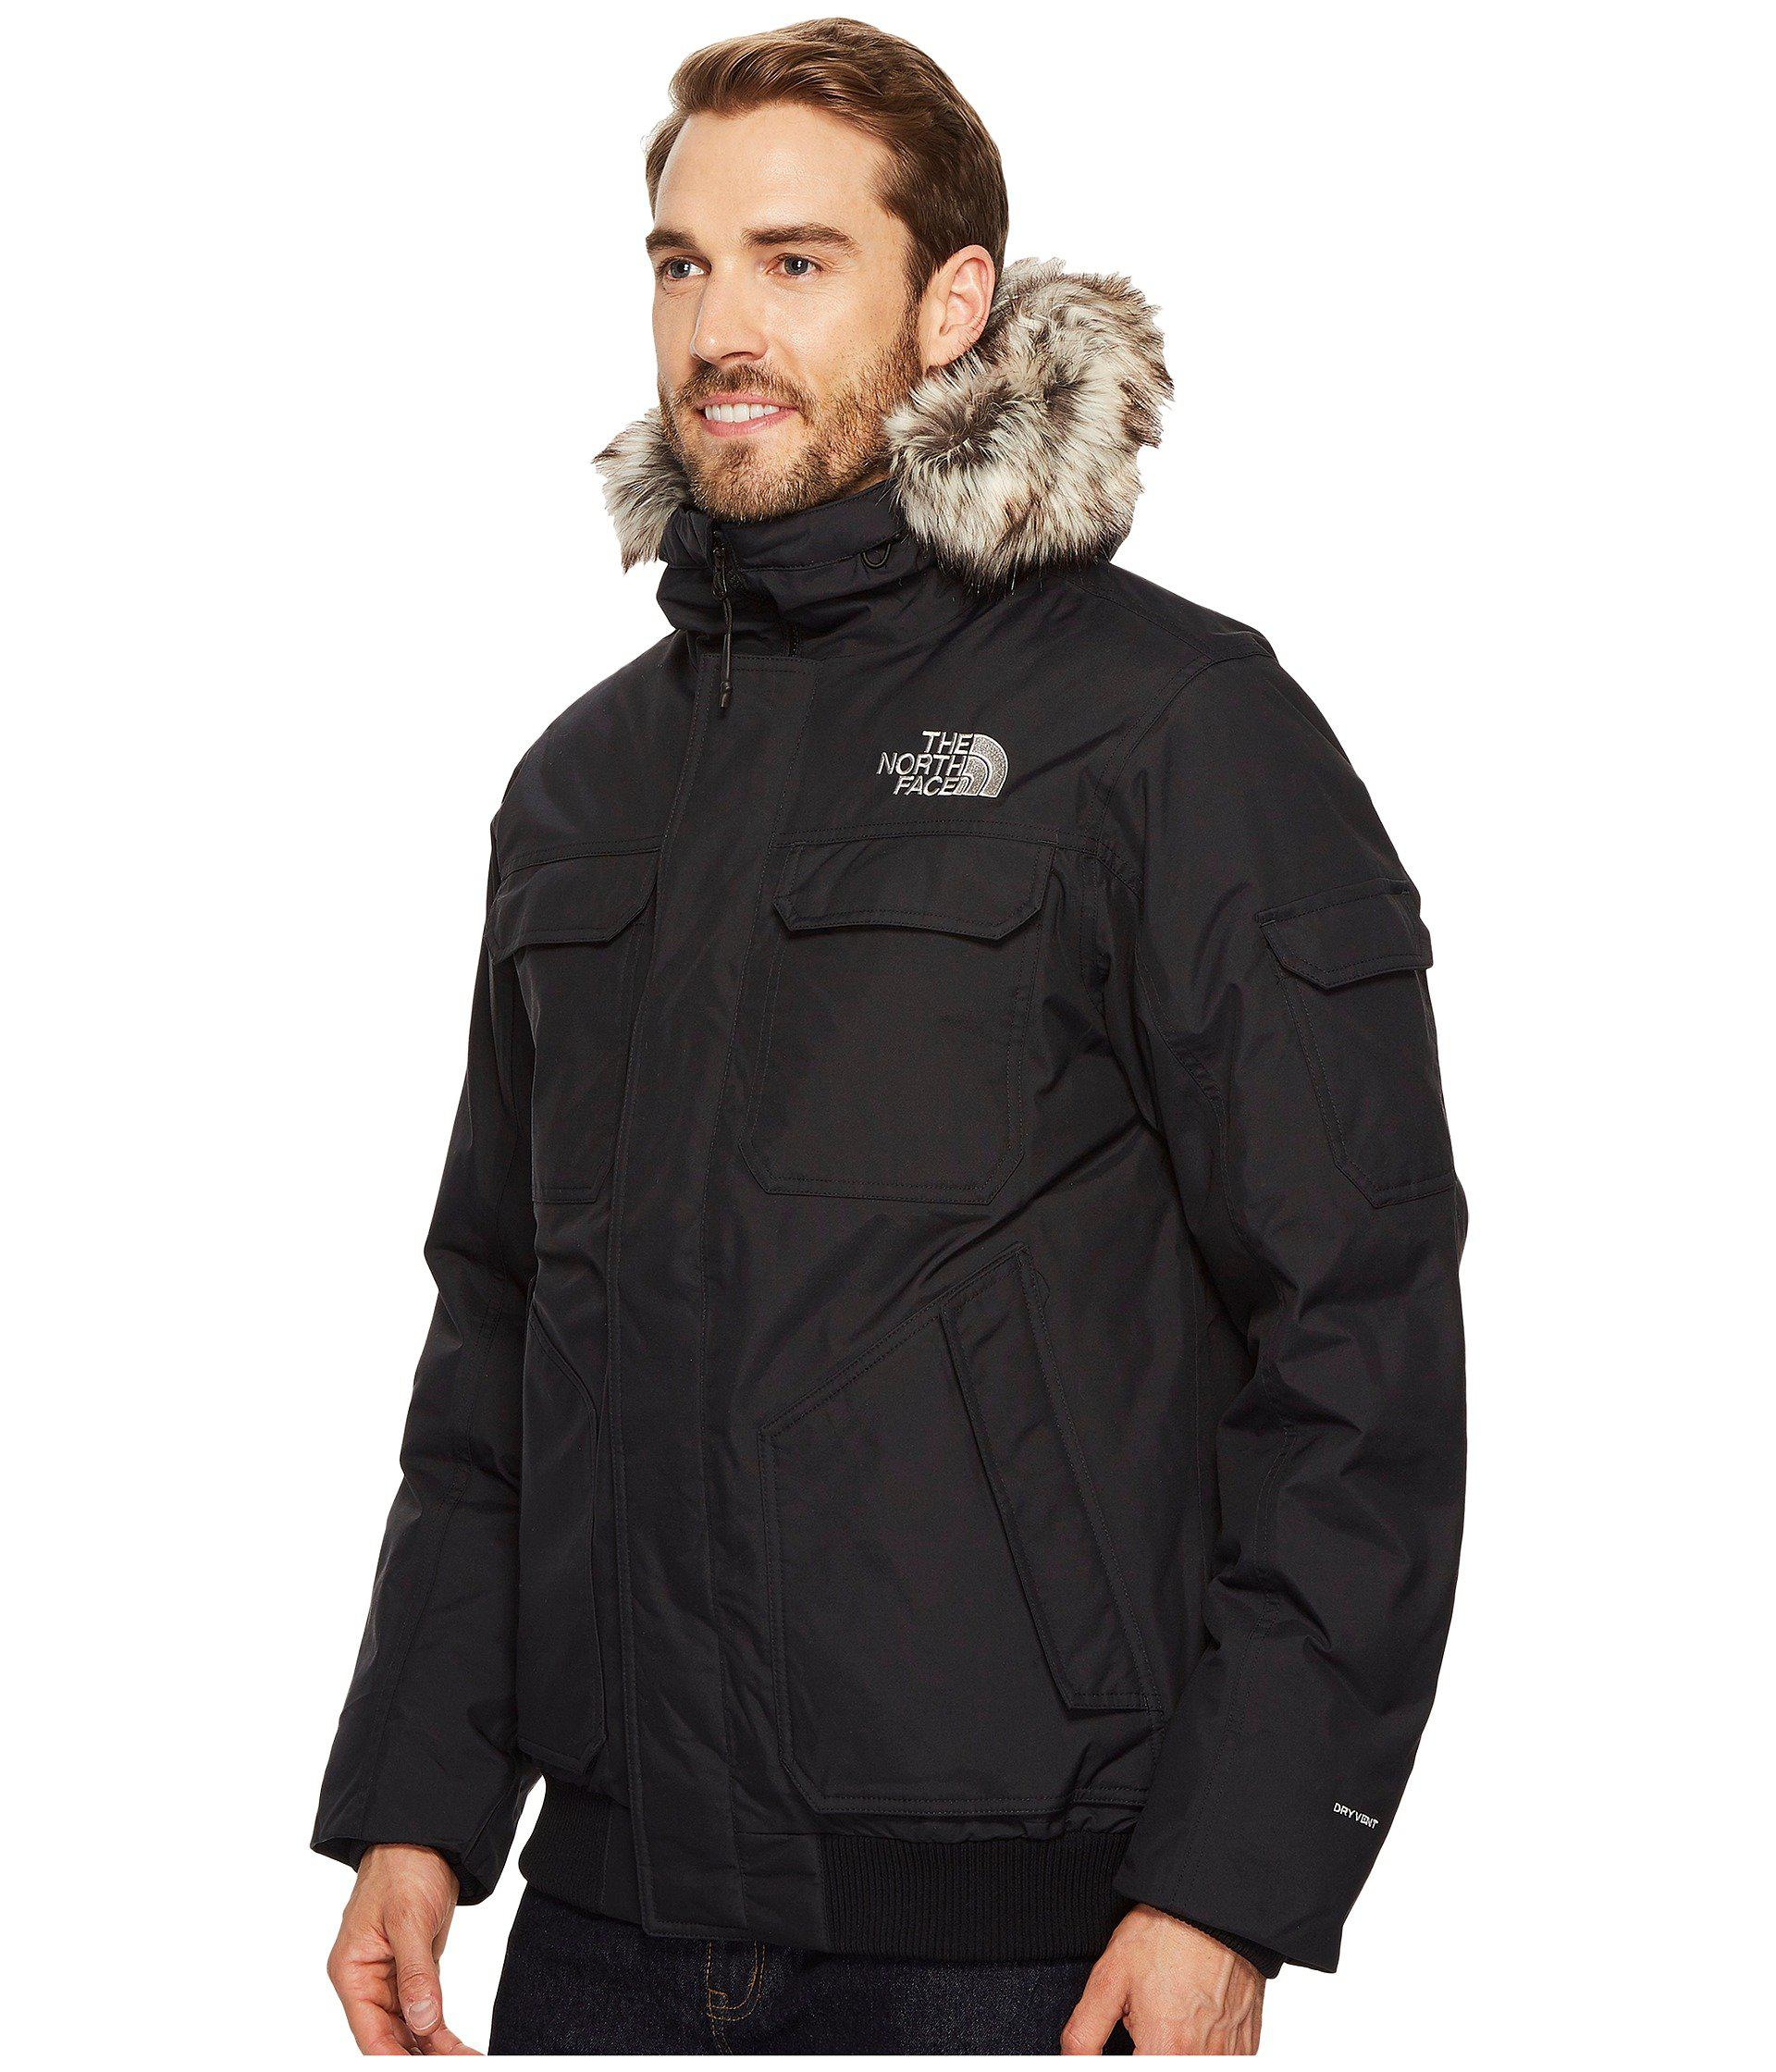 Lyst - The North Face Gotham Jacket Iii (tnf Red tnf Black) Men s Coat in  Black for Men 55fb9f88c